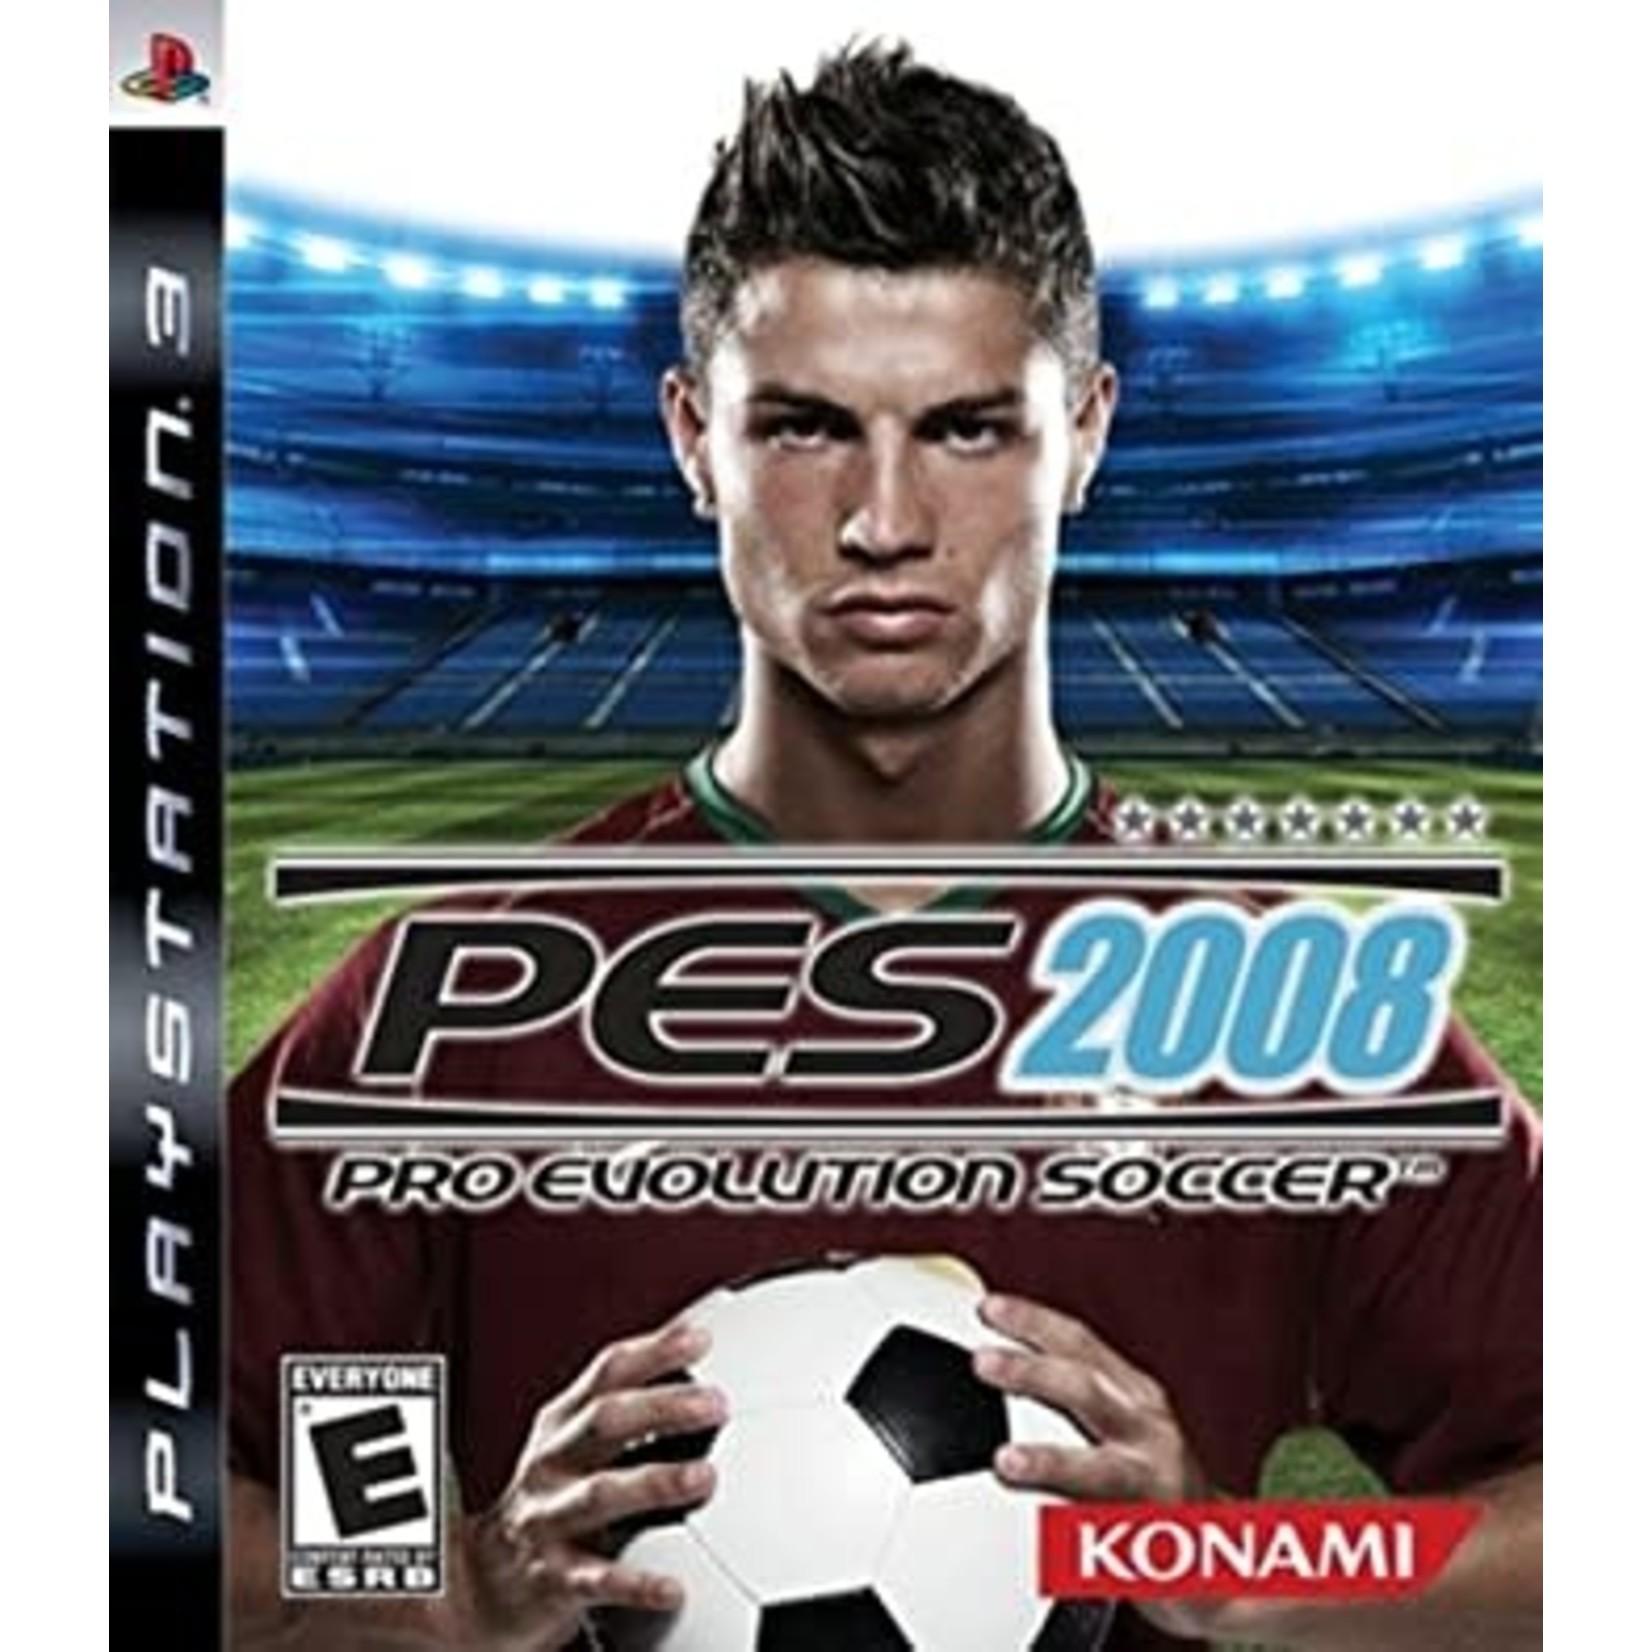 PS3U-Winning Eleven: Pro Soccer 2008